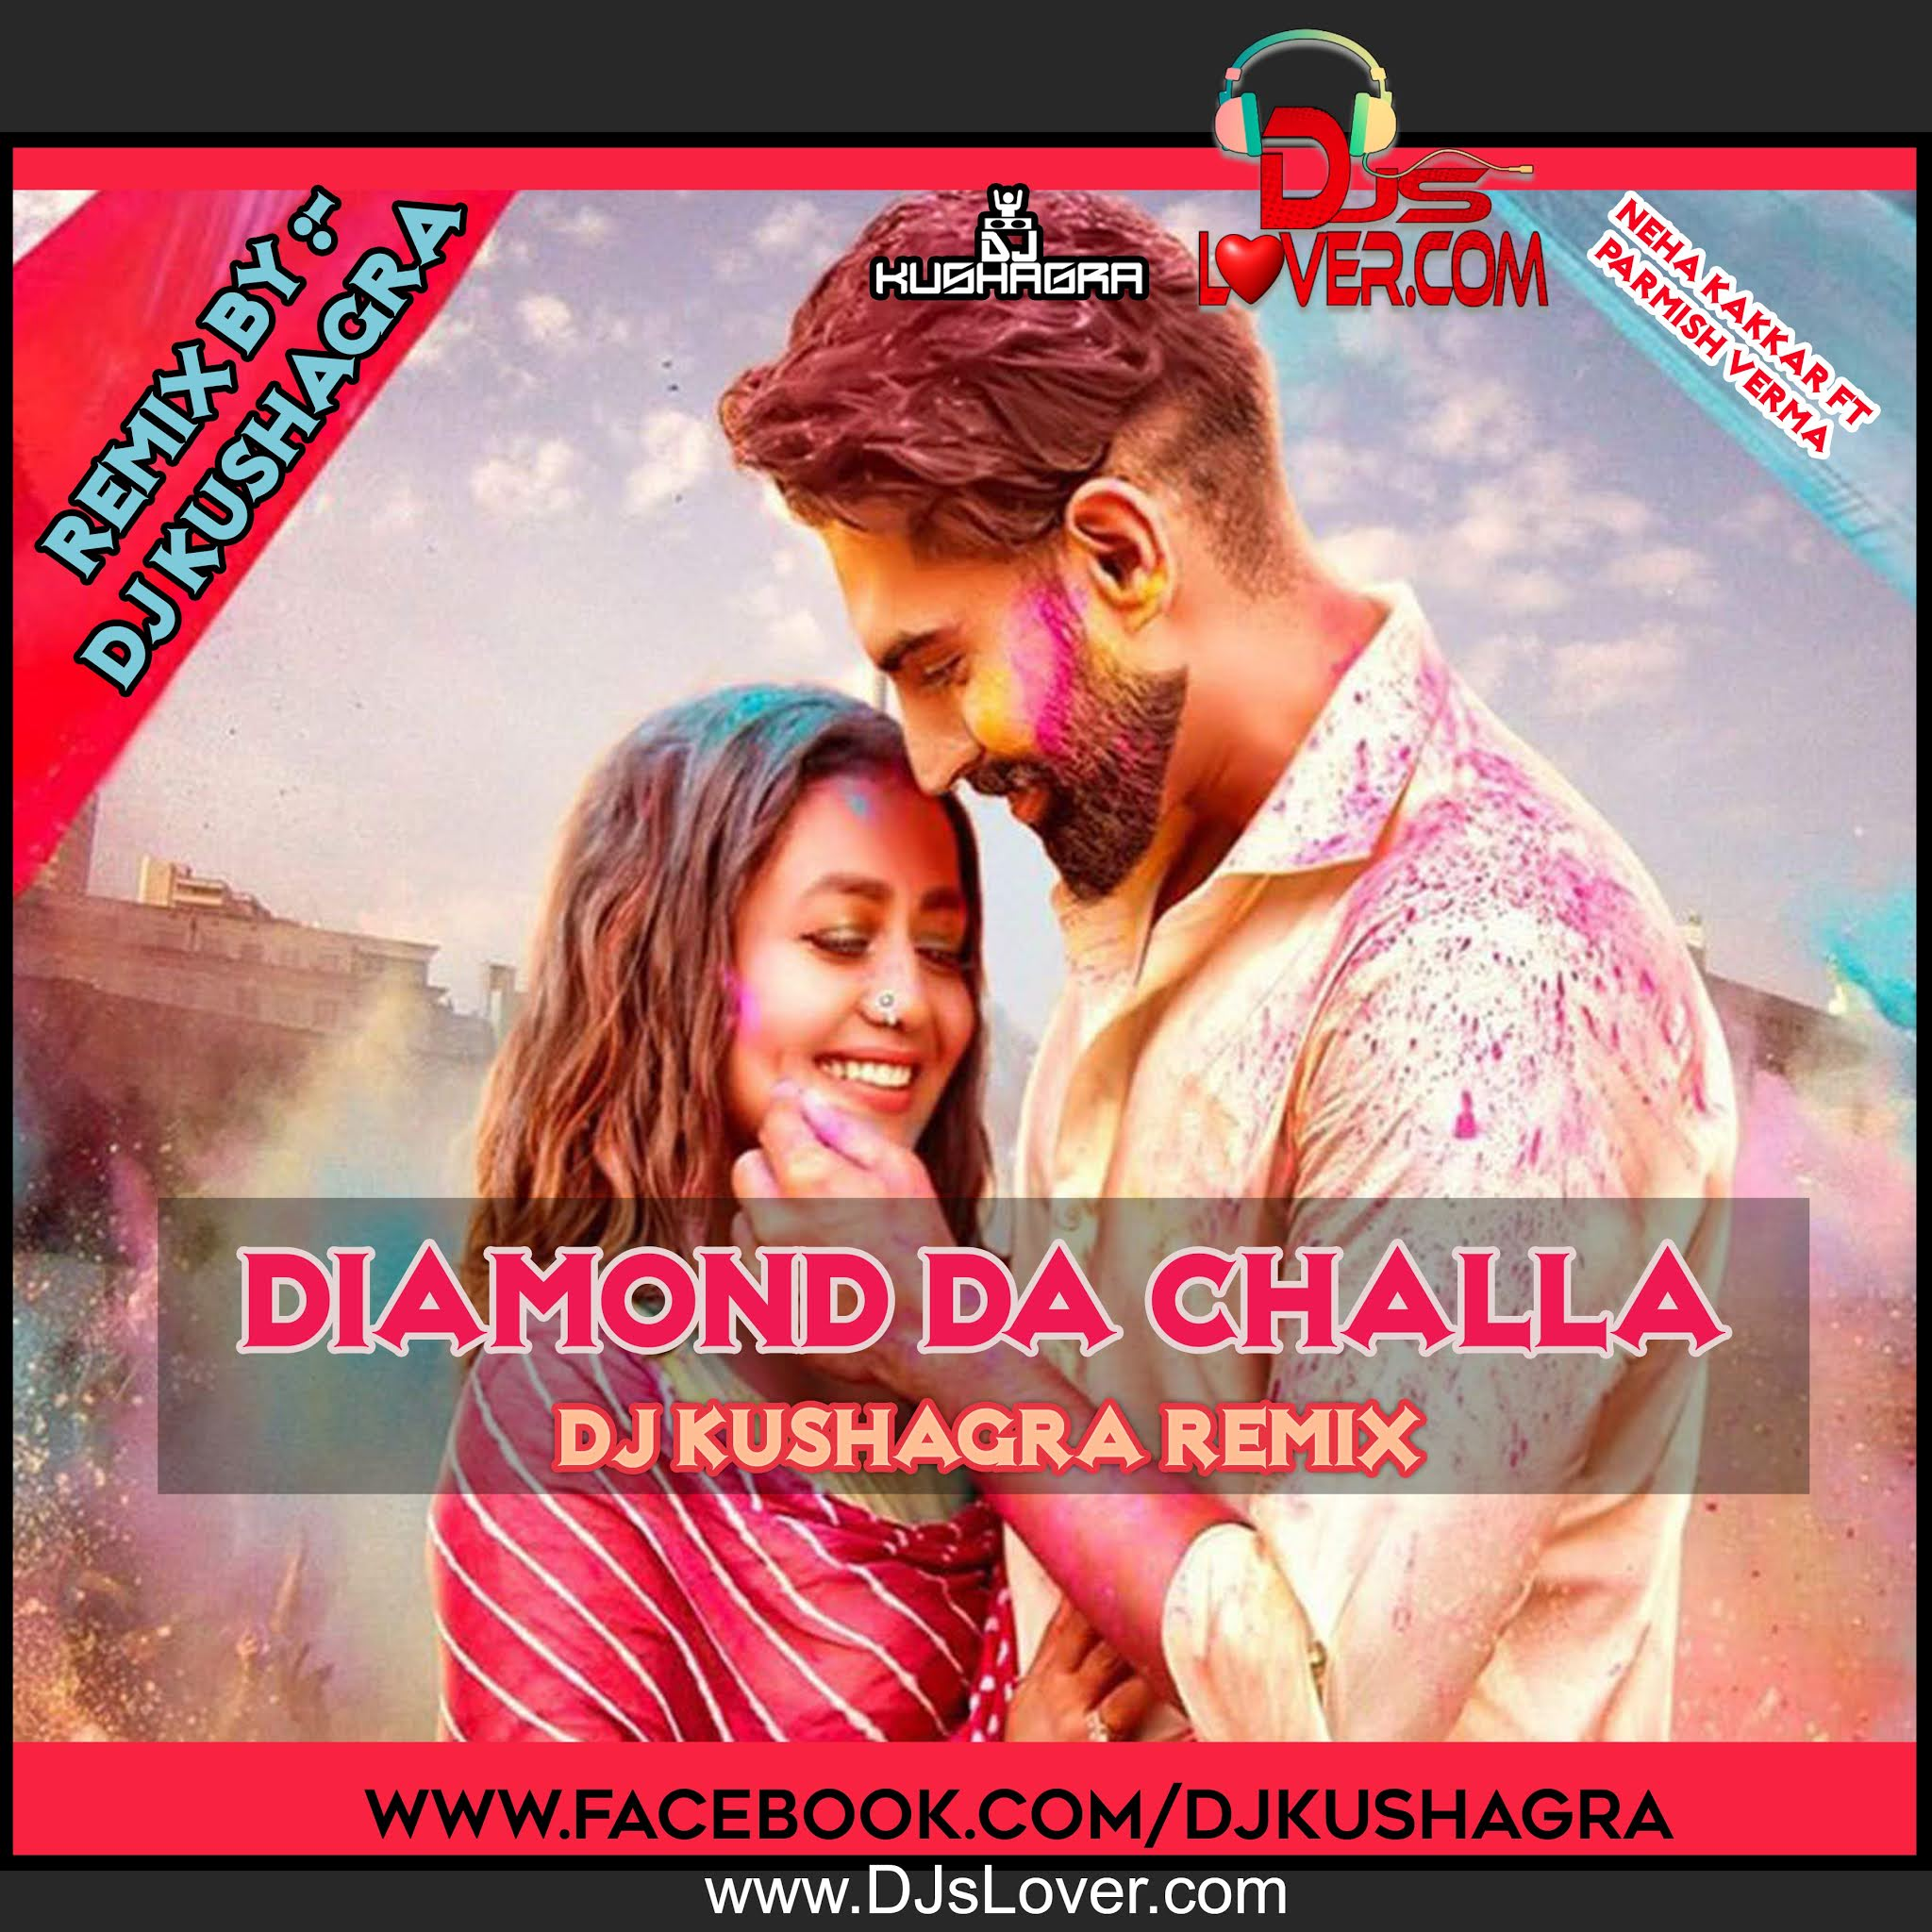 Diamond Da Challa Remix DJ Kushagra FT Parmish Verma x Neha Kakkar